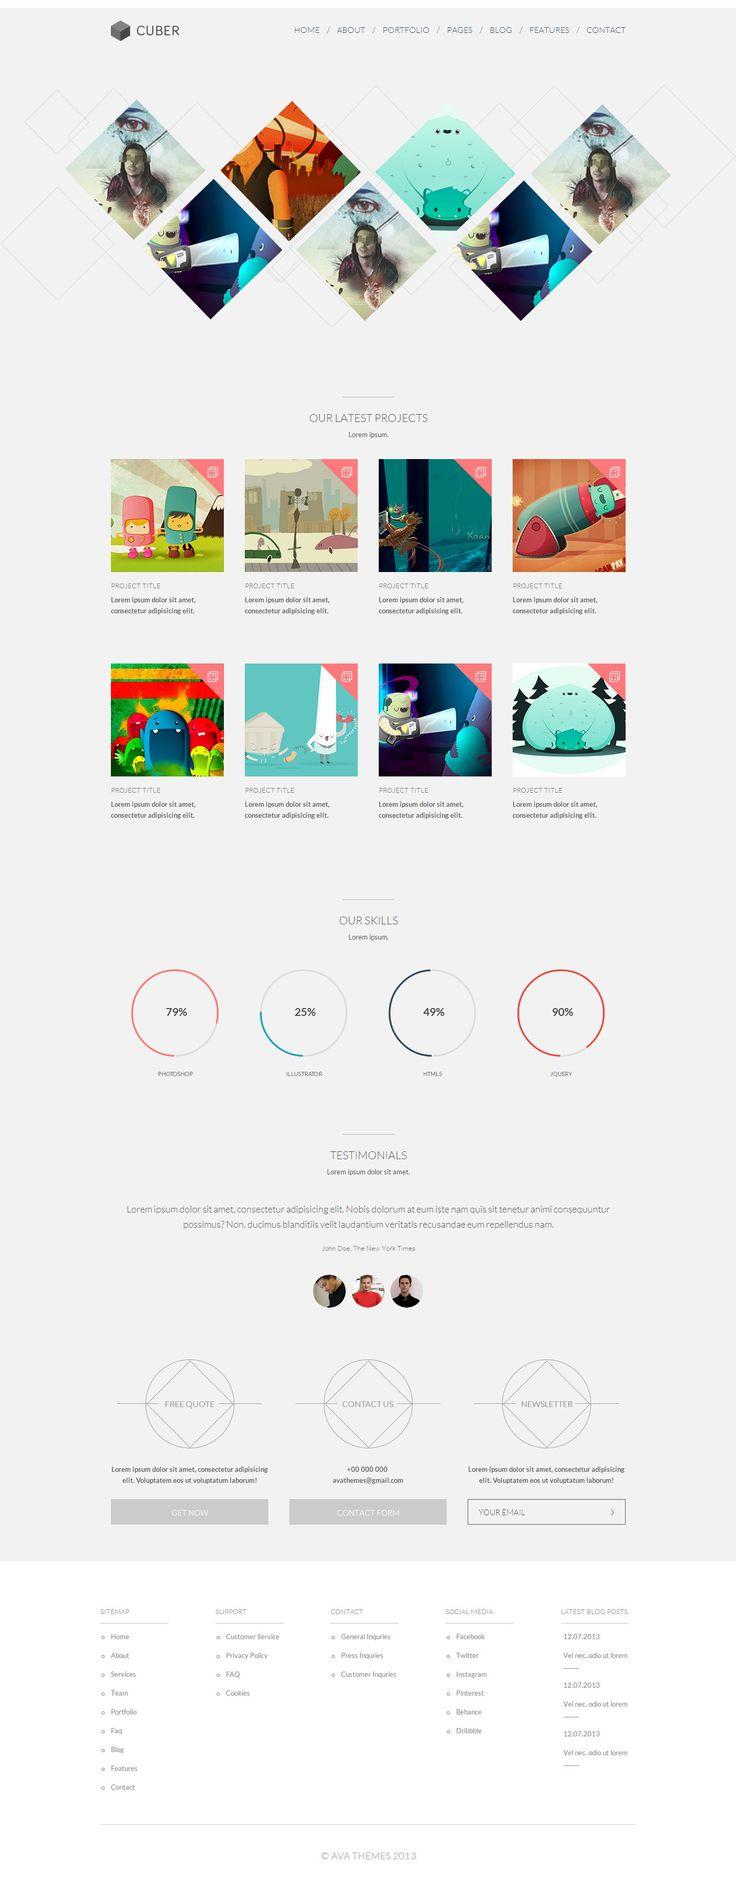 Cuber - Modern Responsive Minimal WordPress Theme http://themeforest.net/item/cuber-modern-responsive-minimal-wordpress-theme/5568261?ref=wpaw #web #design #wordpress